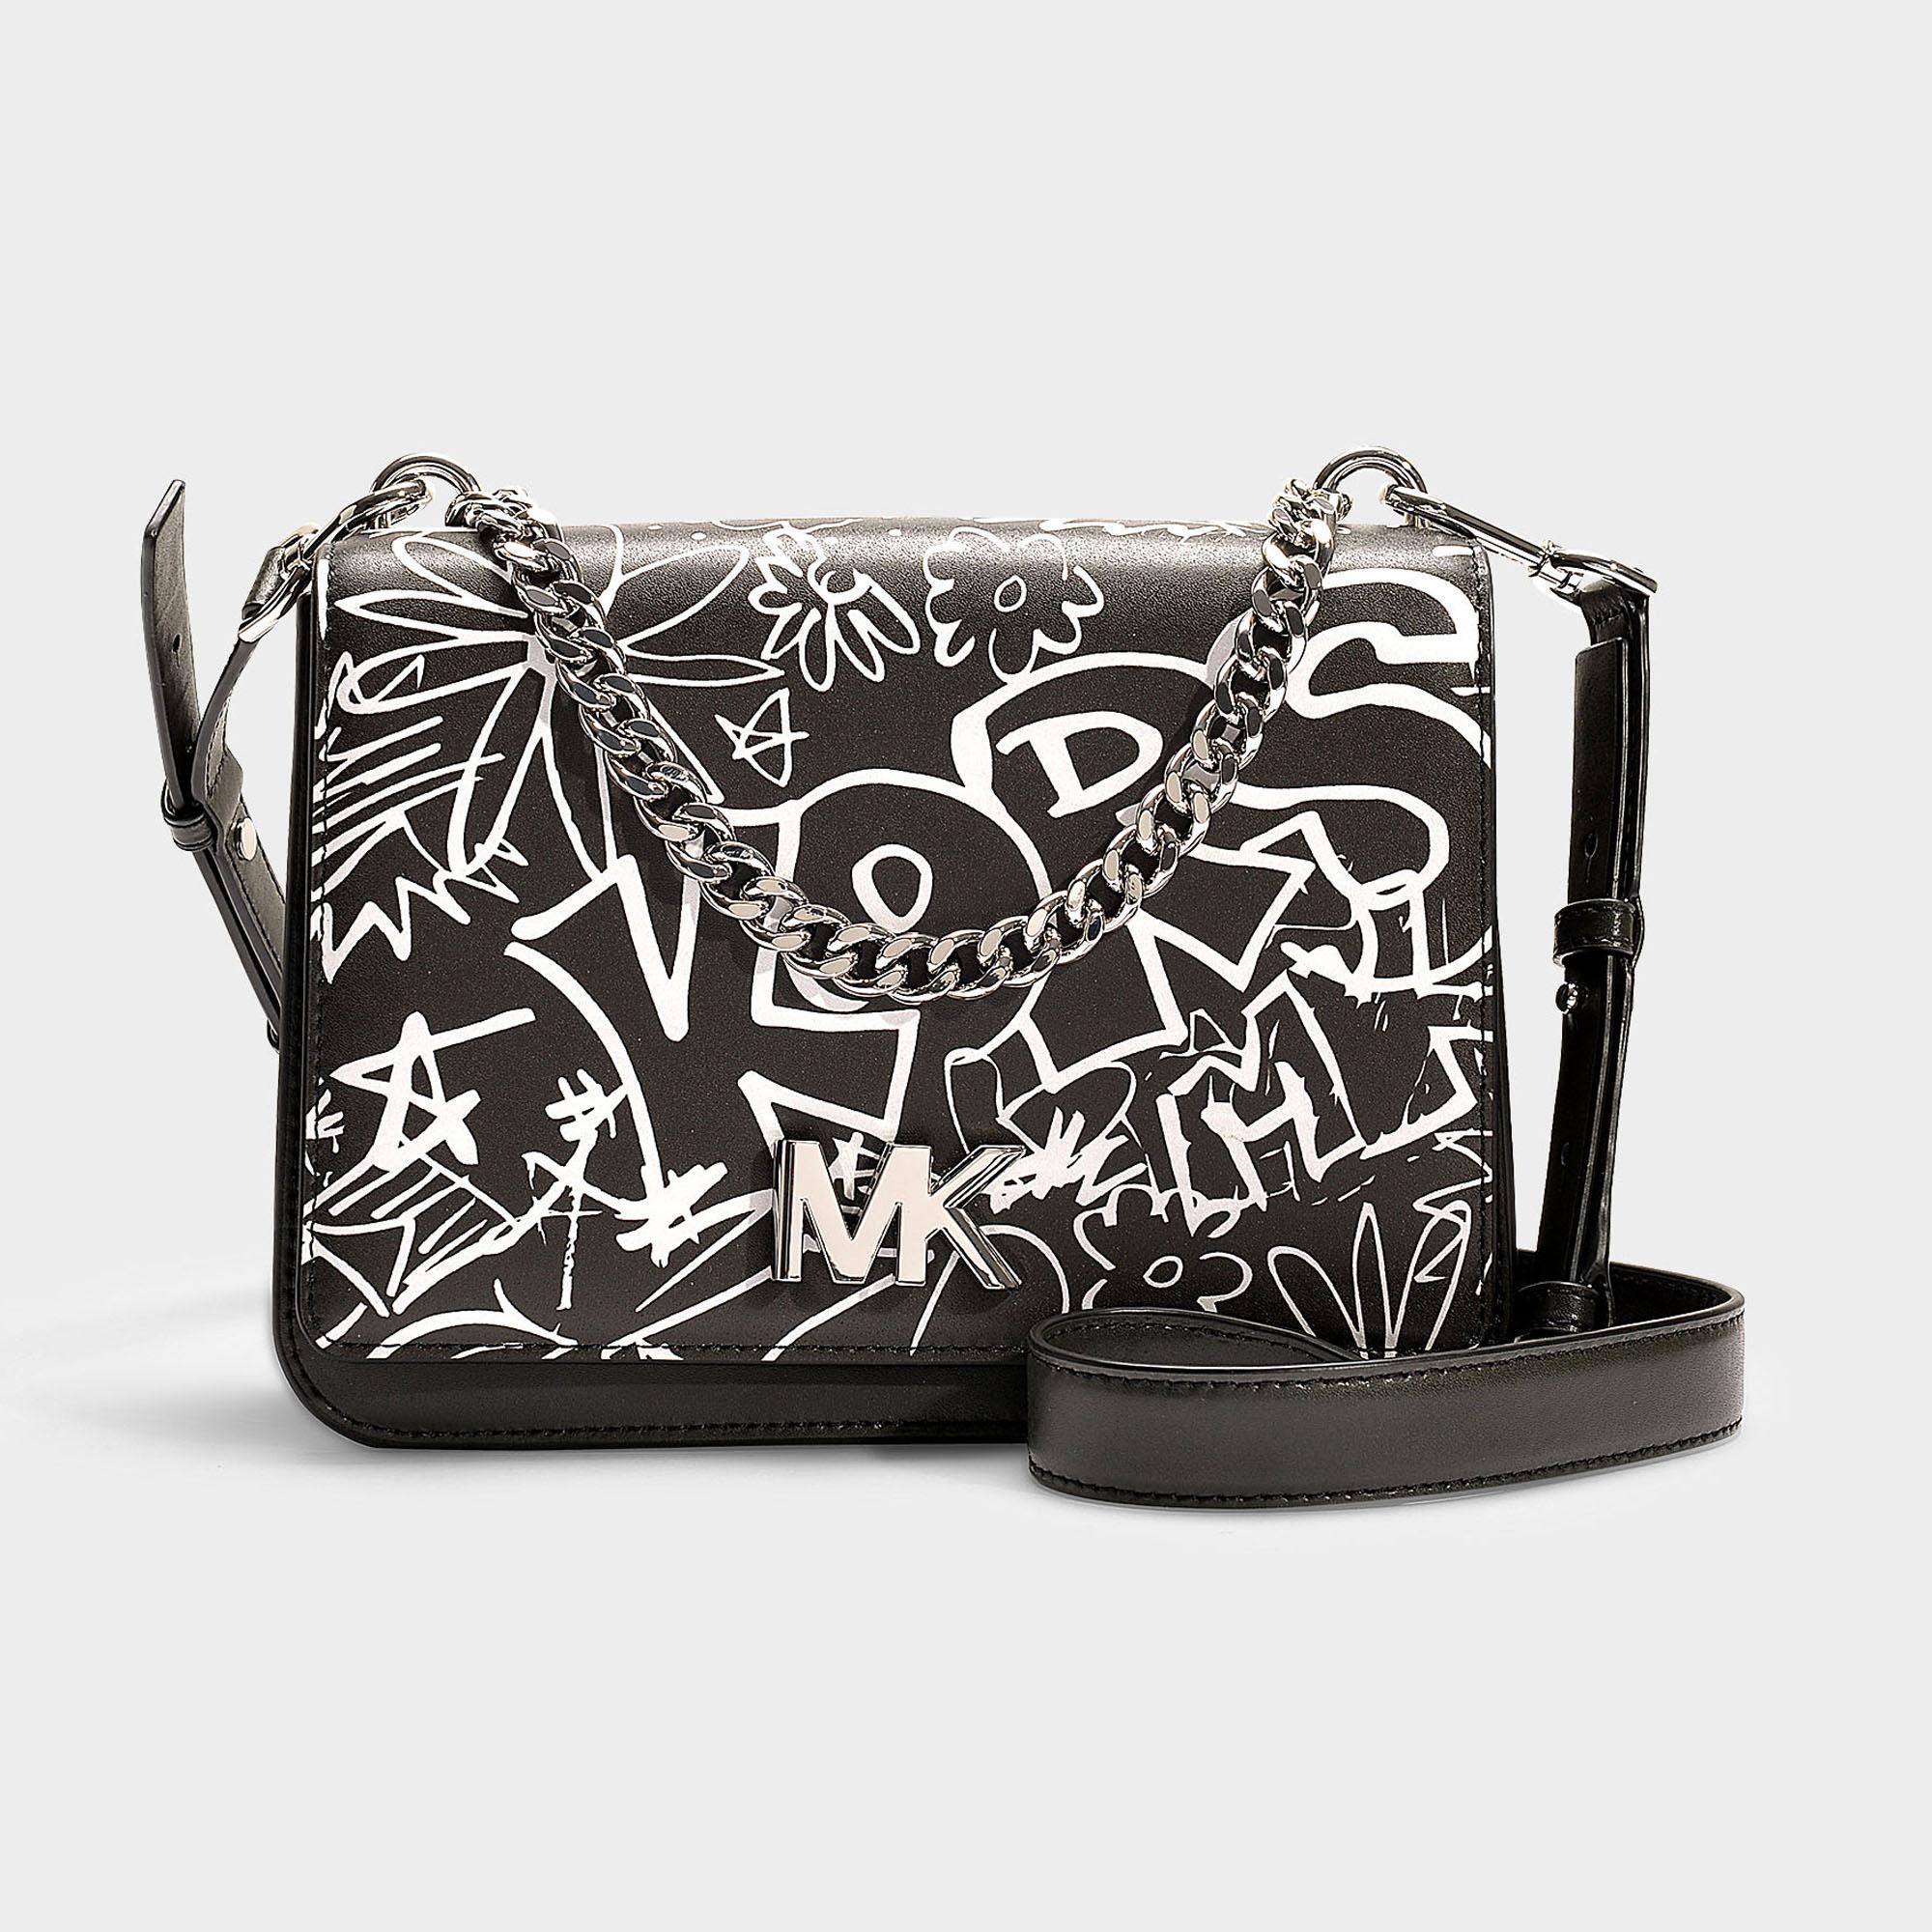 128771828610 Lyst - Michael Michael Kors Mott Large Chain Swag Shoulder Bag In ...